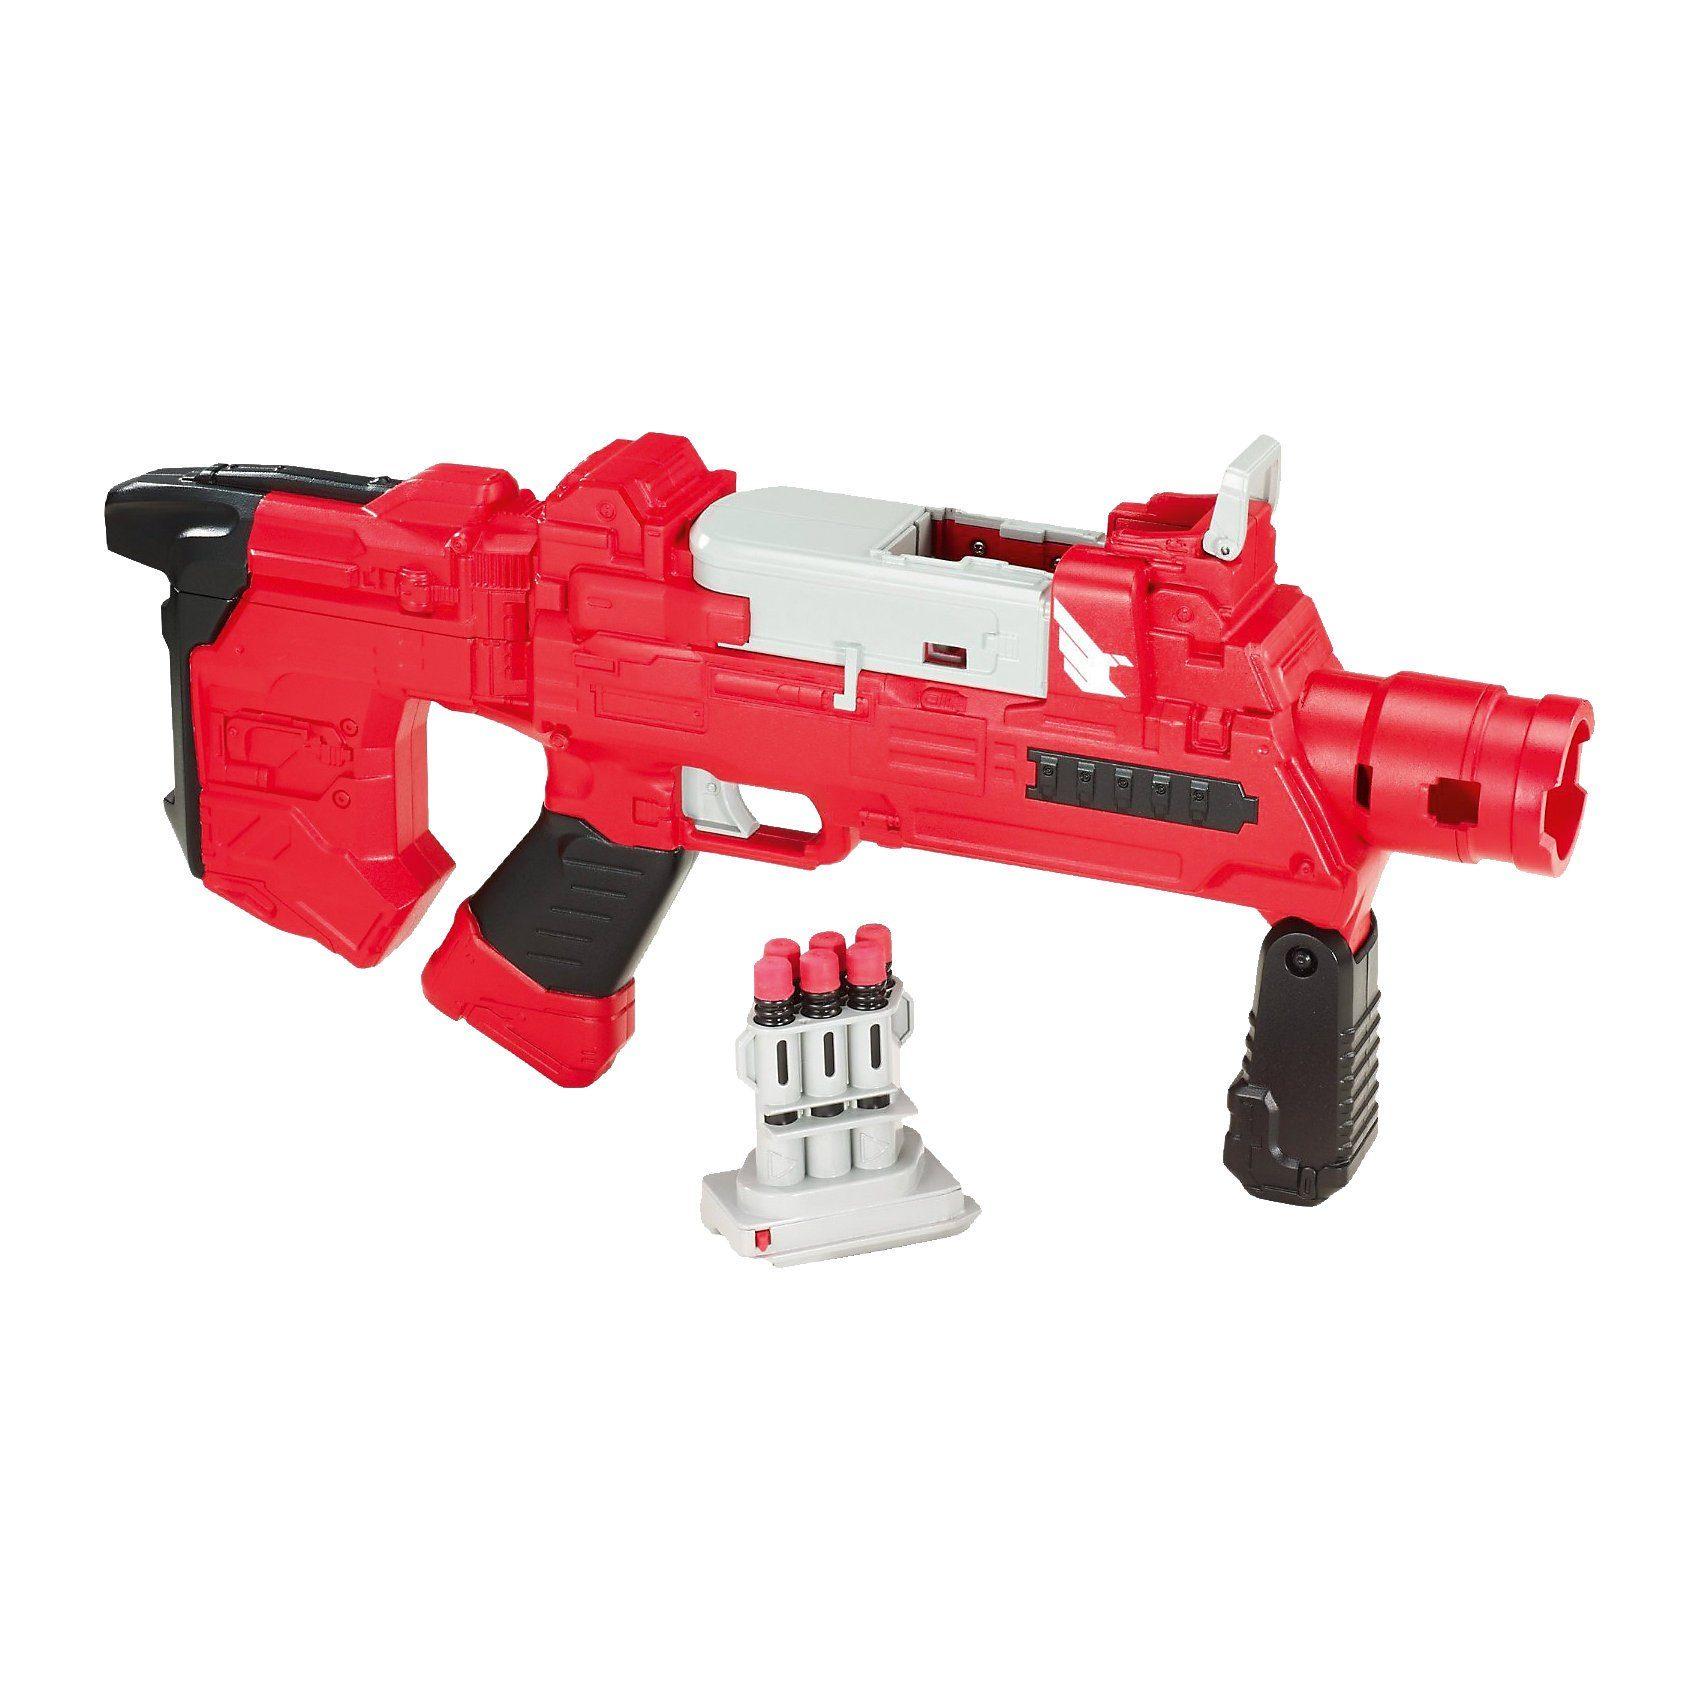 Mattel BoomCo UNSC SMG Blaster